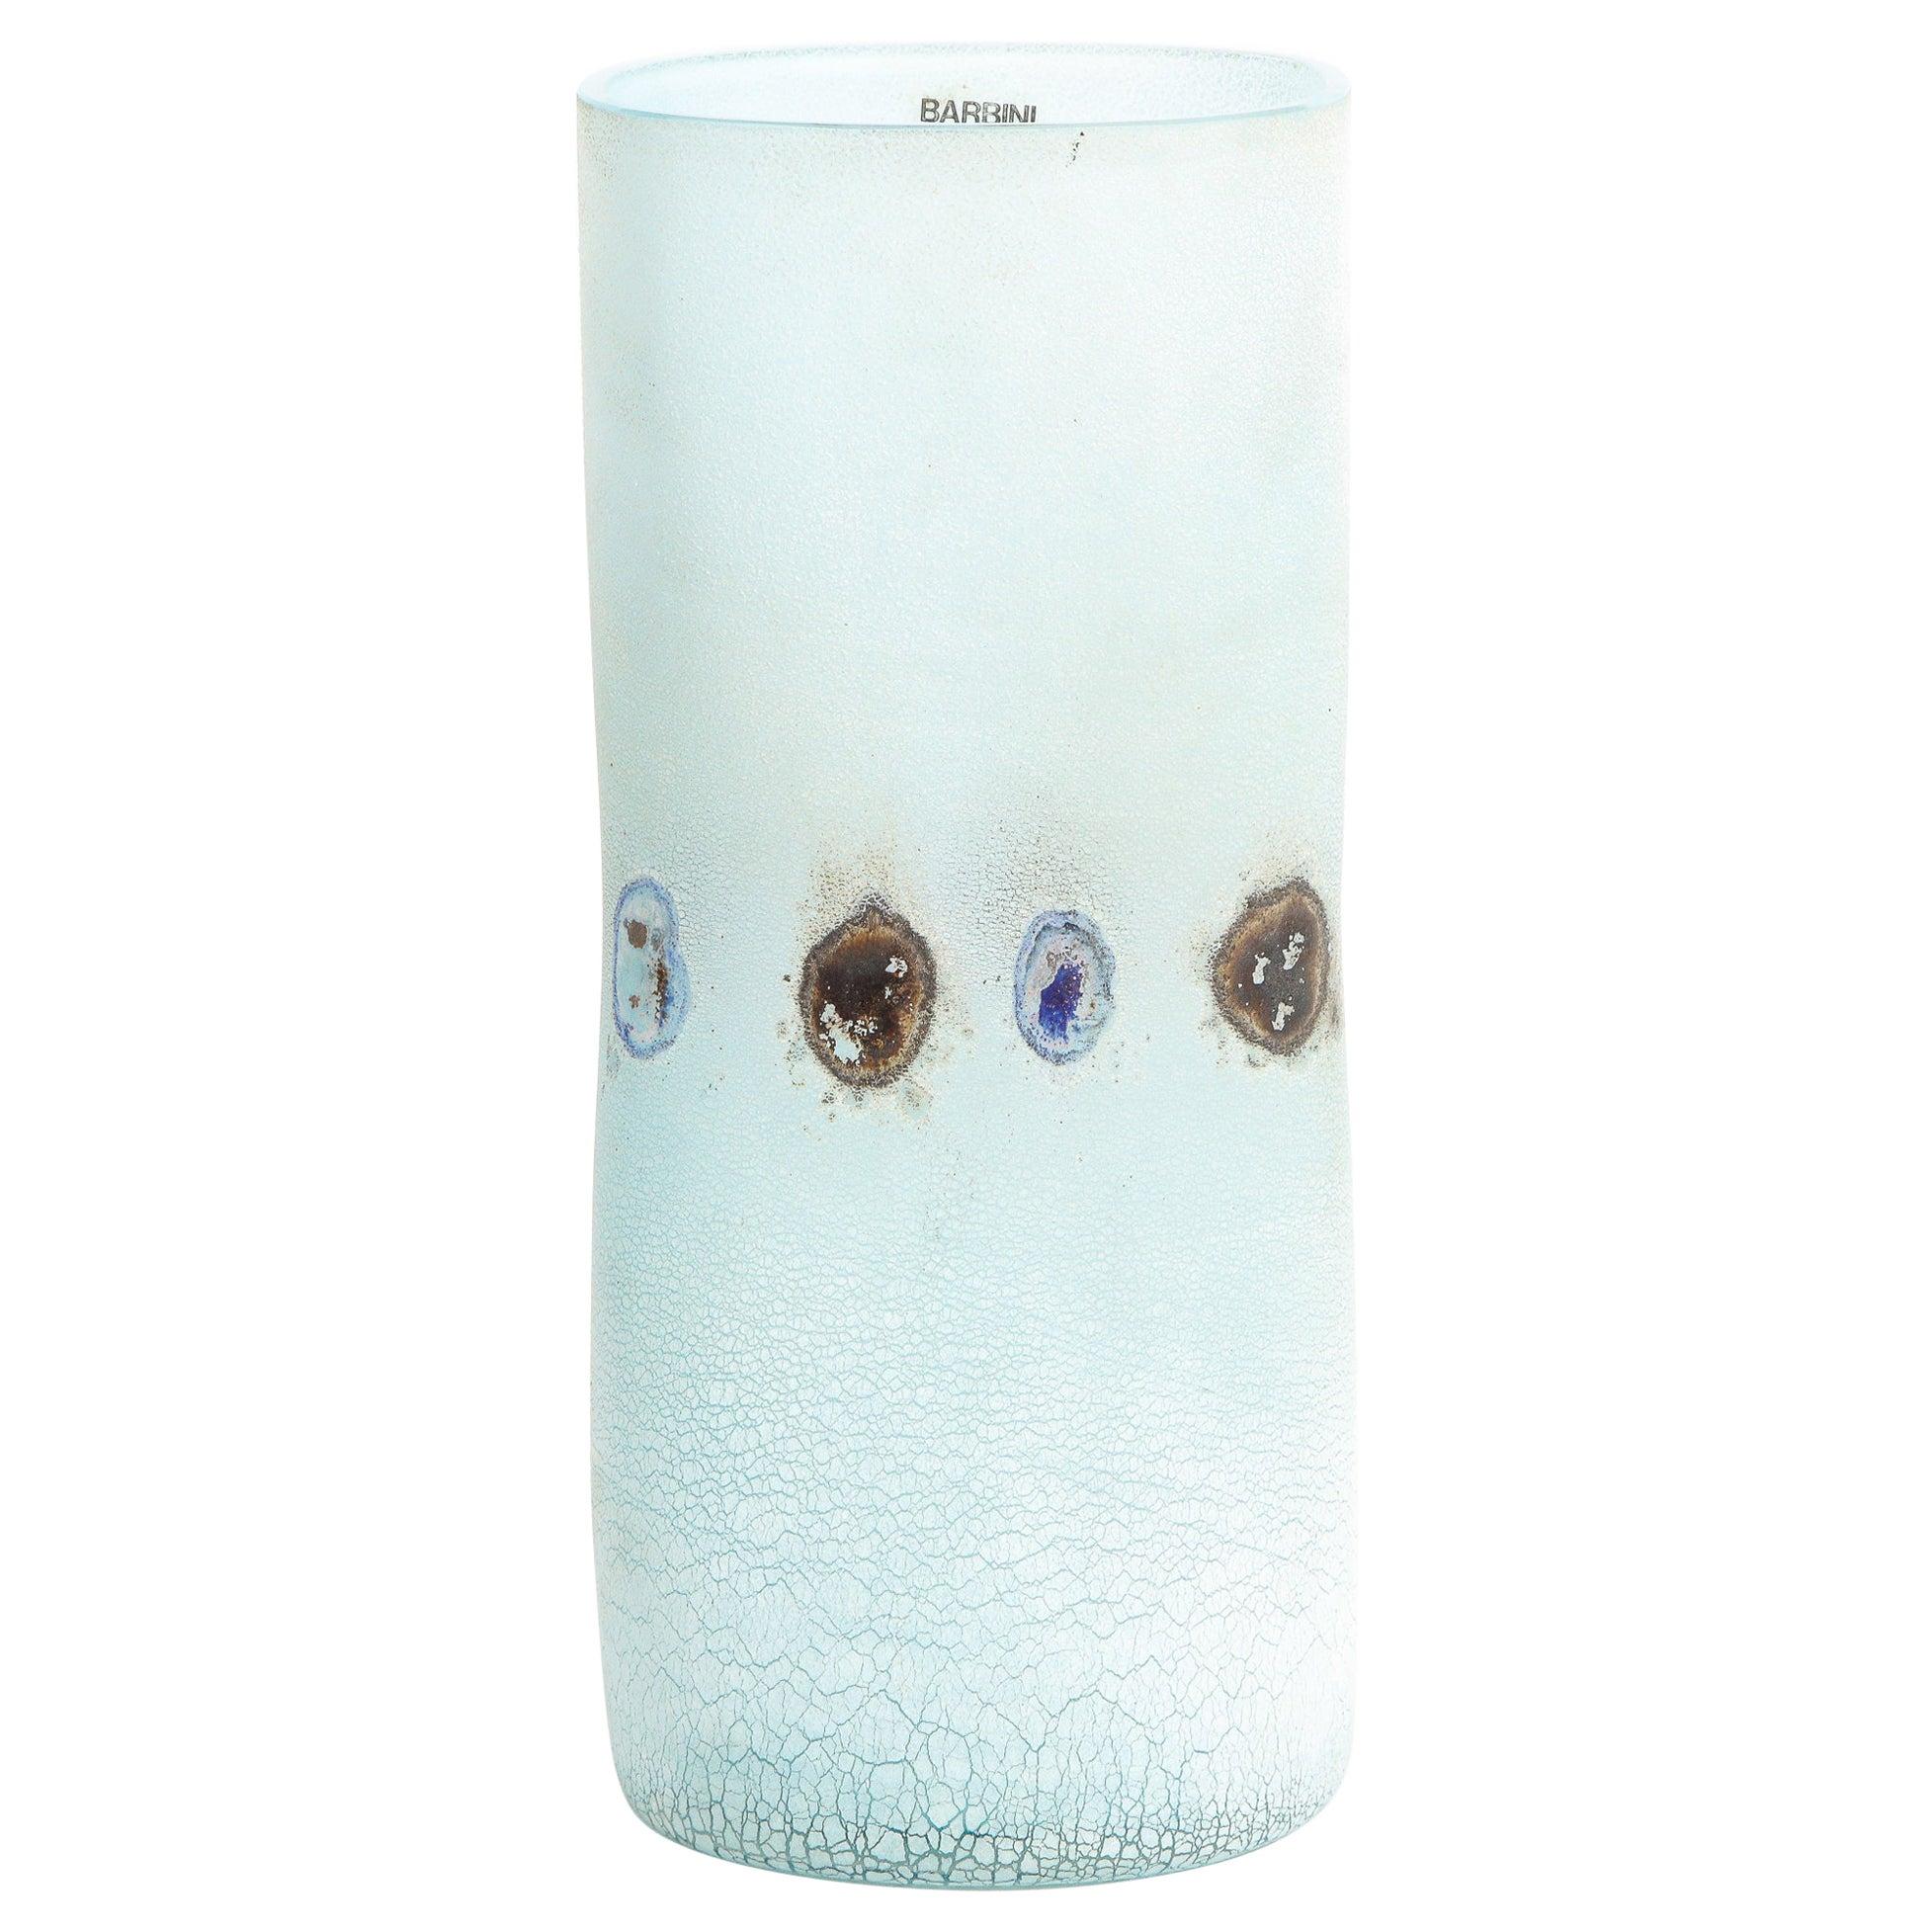 Barbini Midcentury Craqueleur Powder Blue Murano Glass Vase with Organic Detail